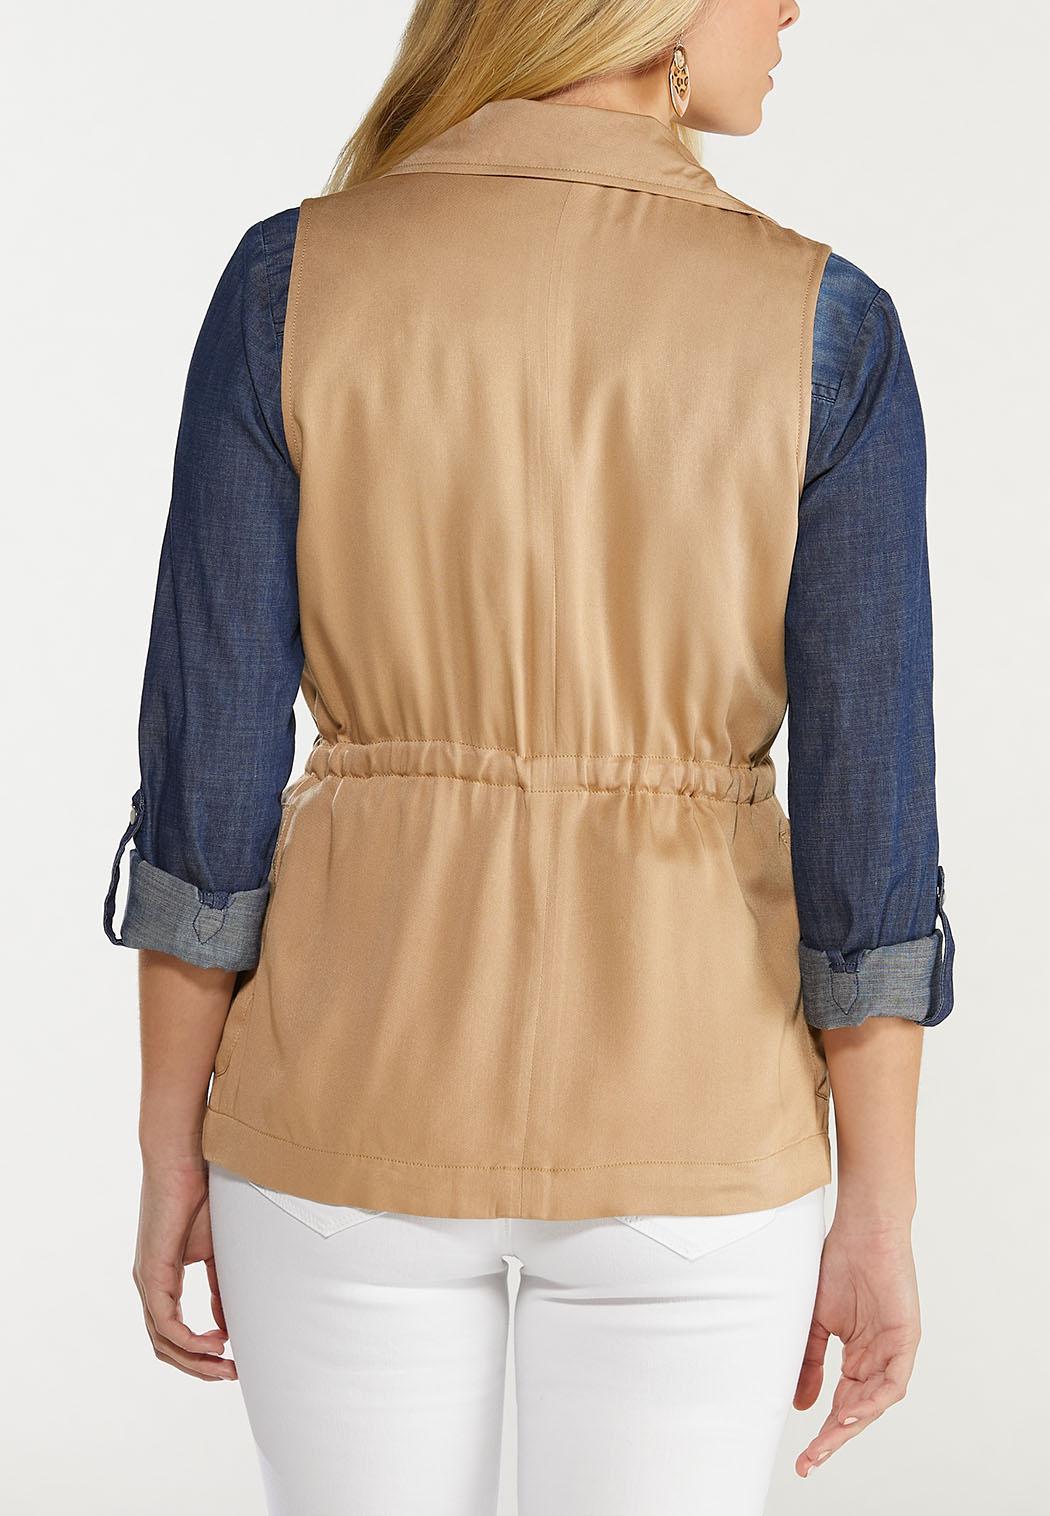 Cinched Waist Utility Vest (Item #44466067)